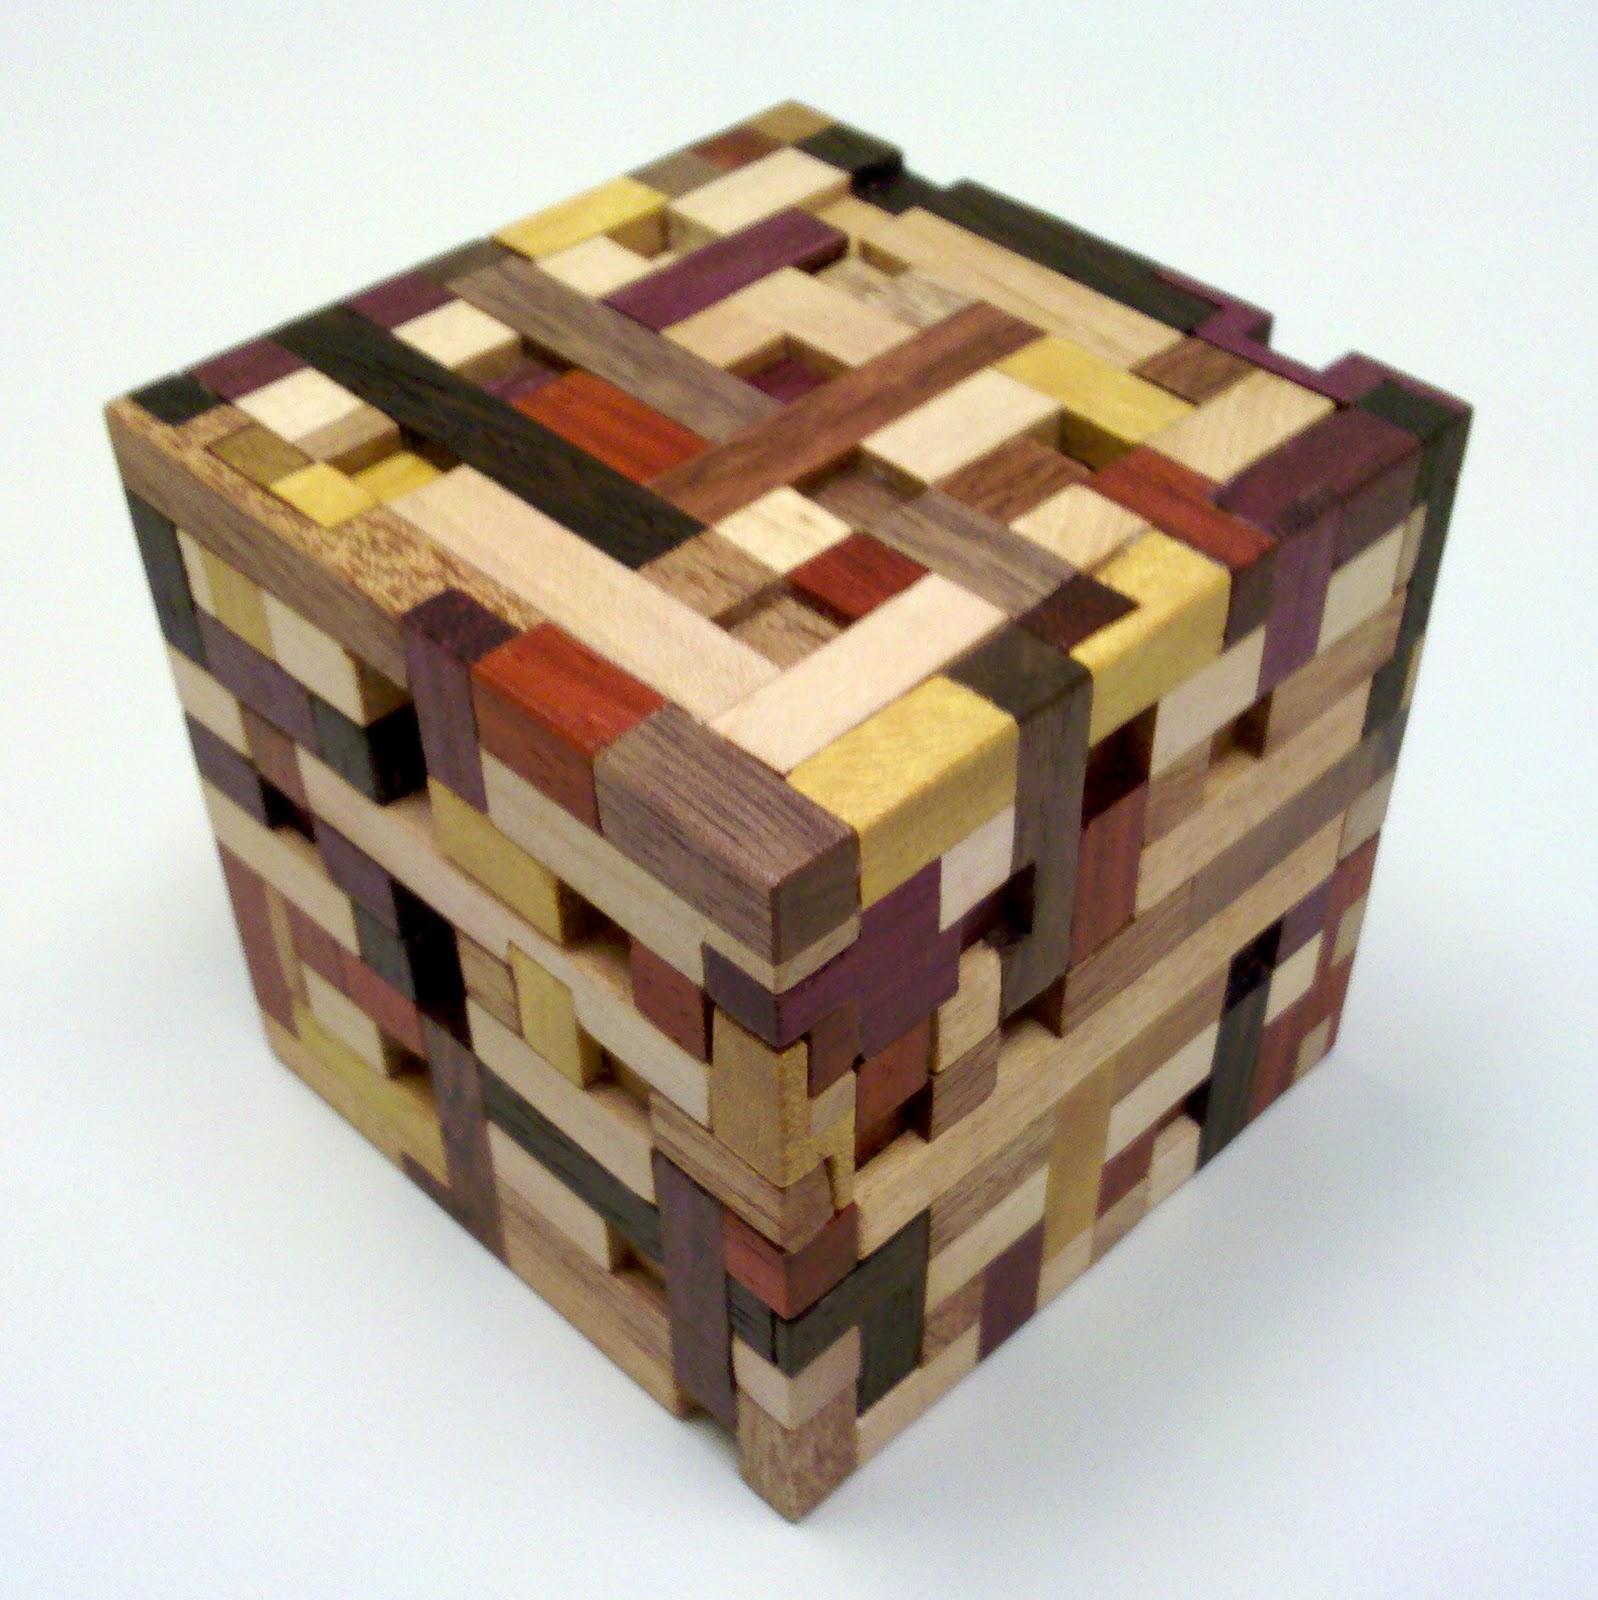 Brian's Damn Puzzle Blog: Gordian Knot Puzzle Box